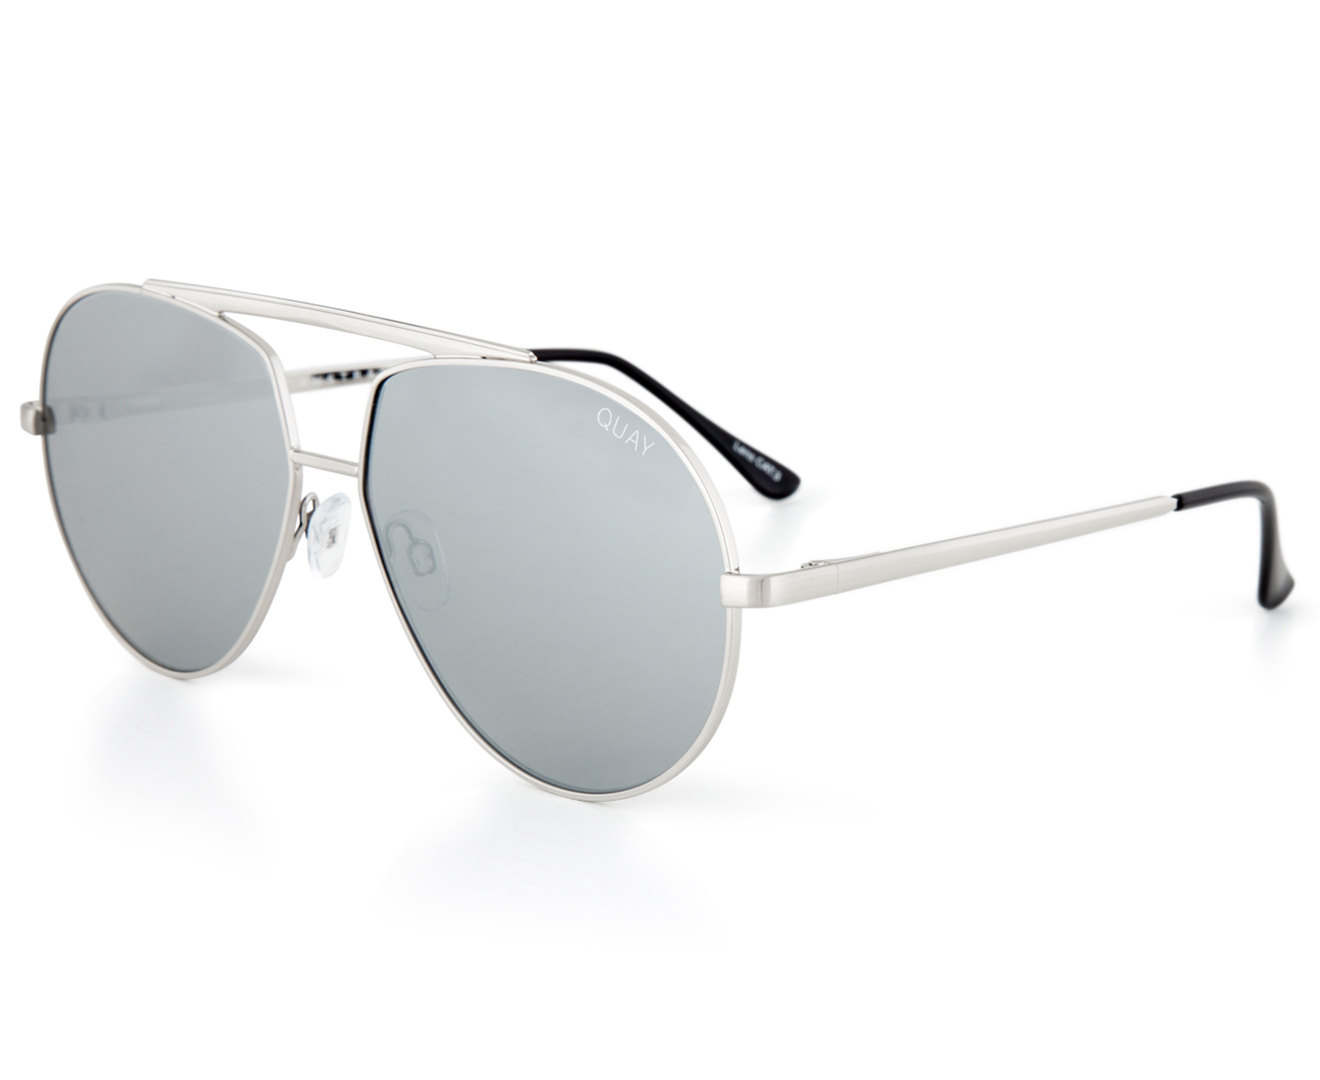 846a891697 Quay Australia Blaze Sunglasses - Silver Silver